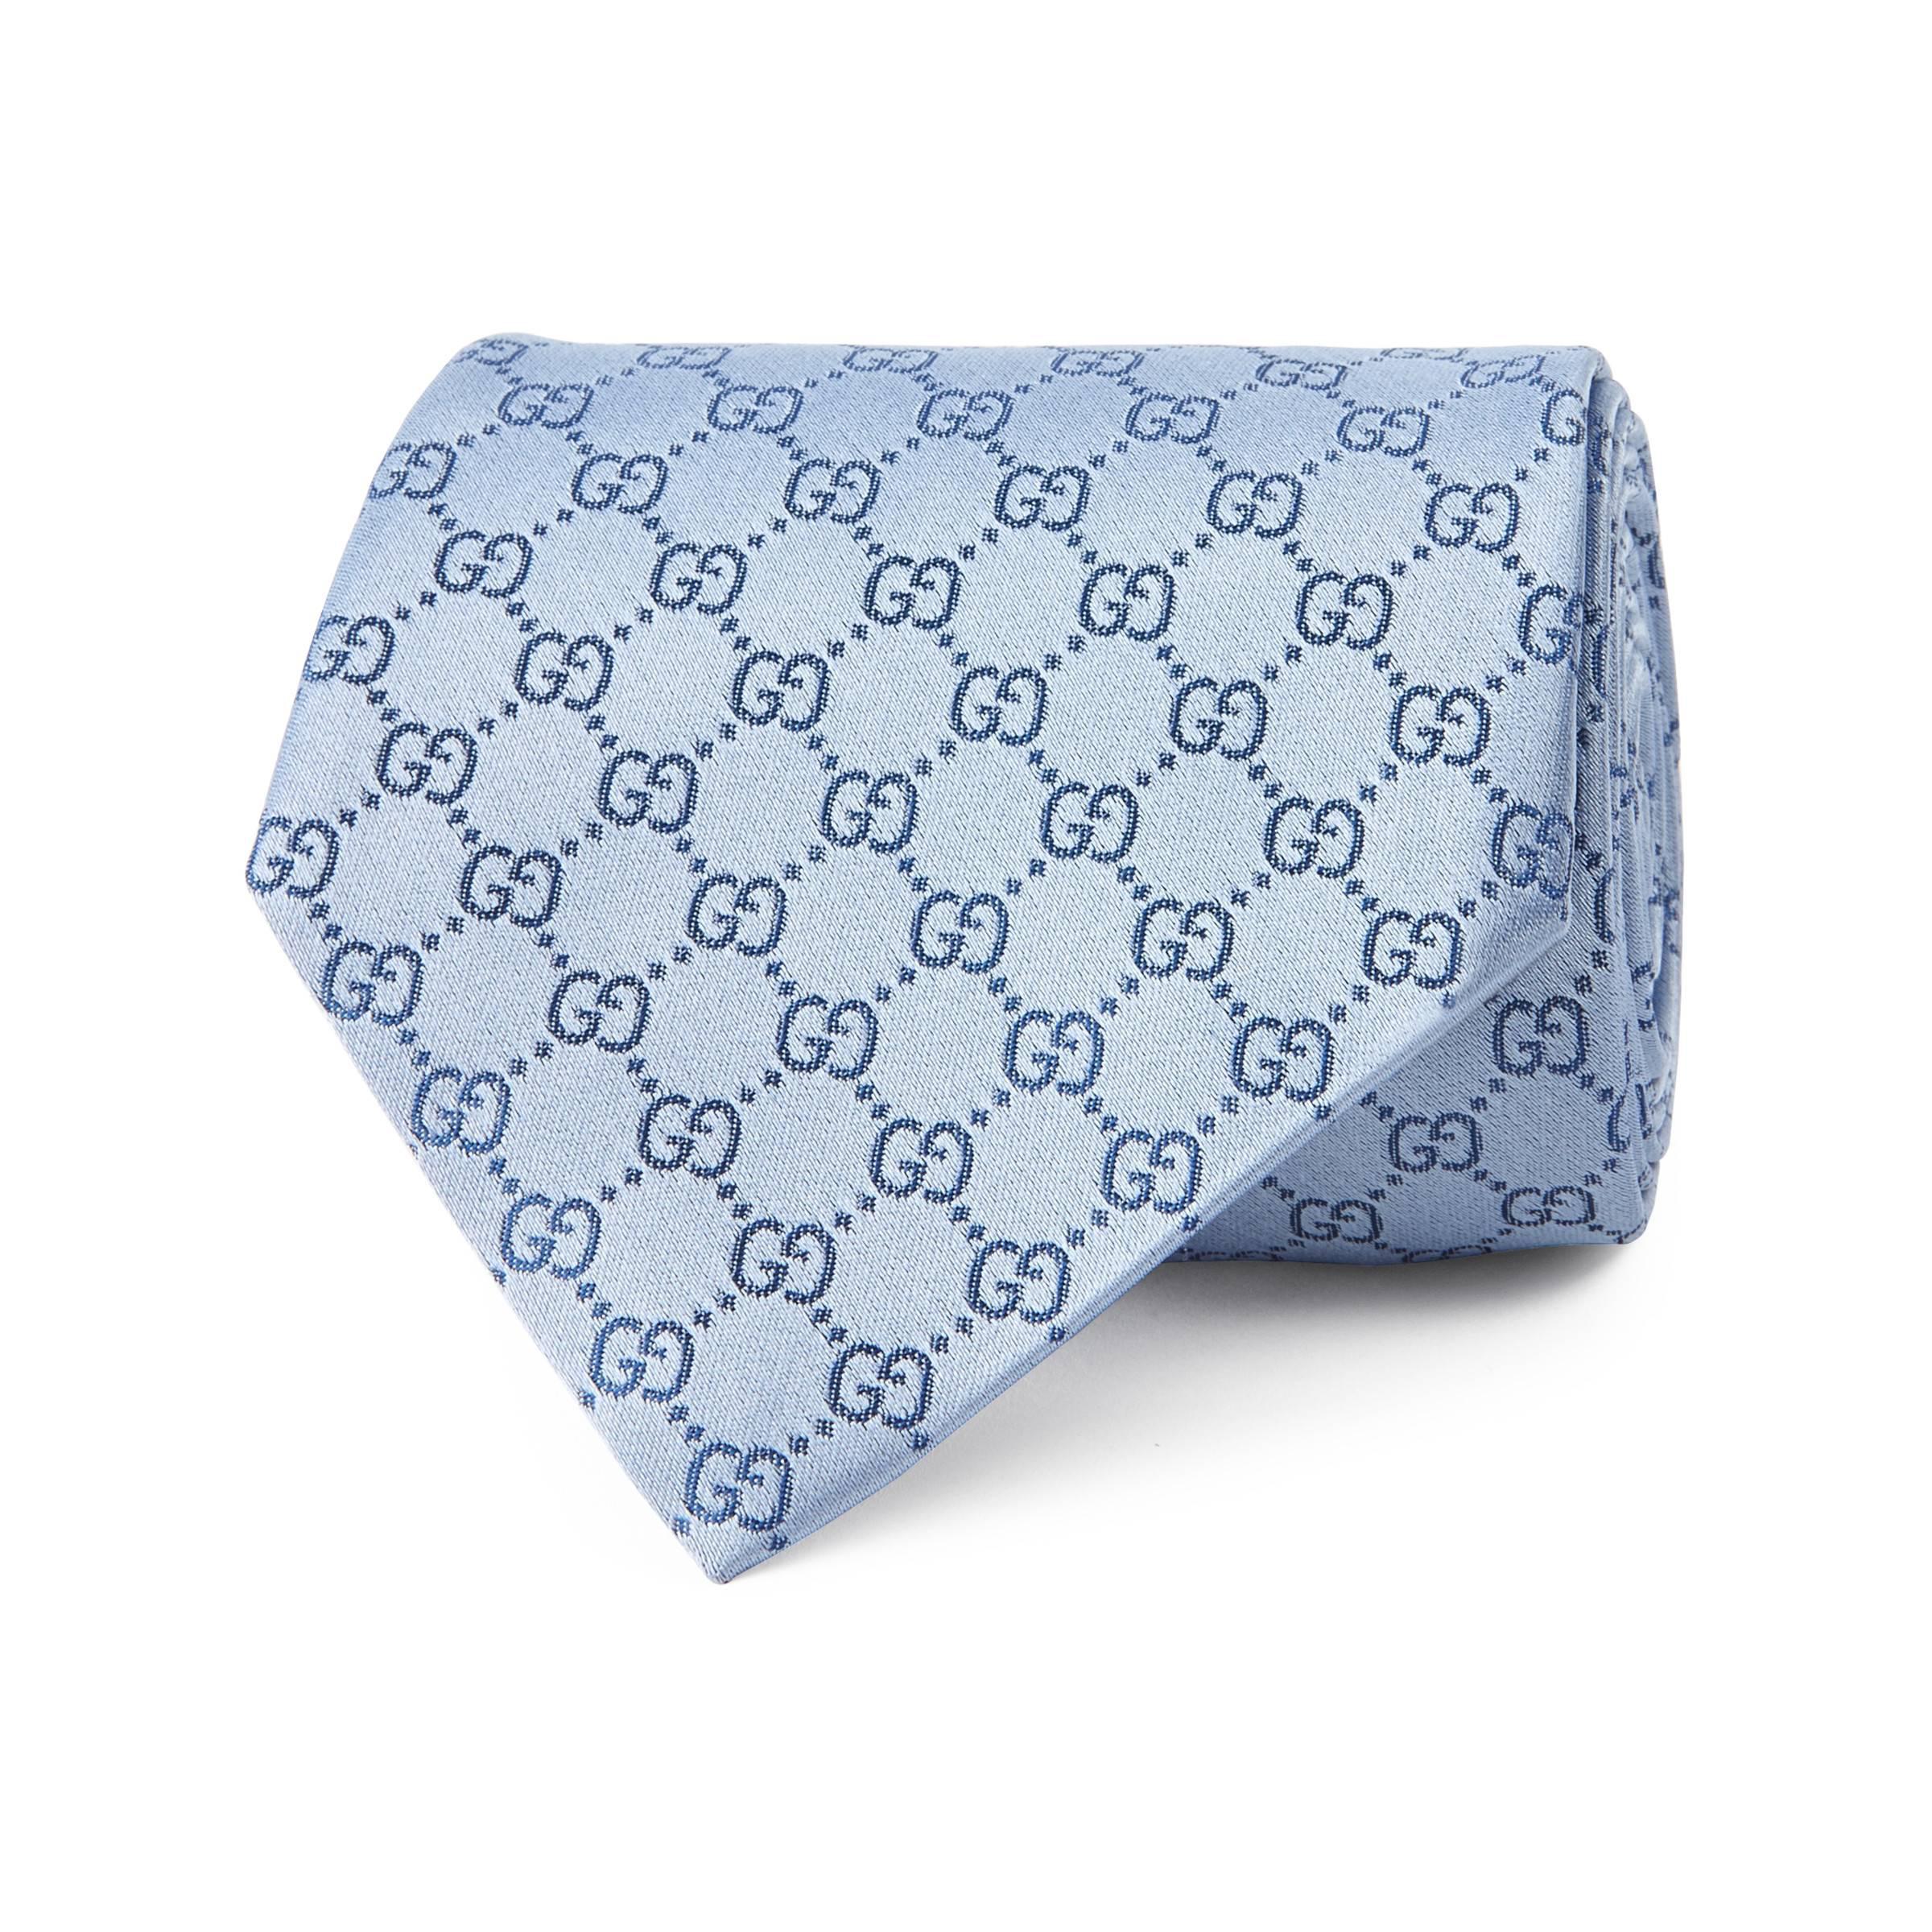 e6bdbf30ac9 Gucci - Blue GG Pattern Silk Tie for Men - Lyst. View fullscreen